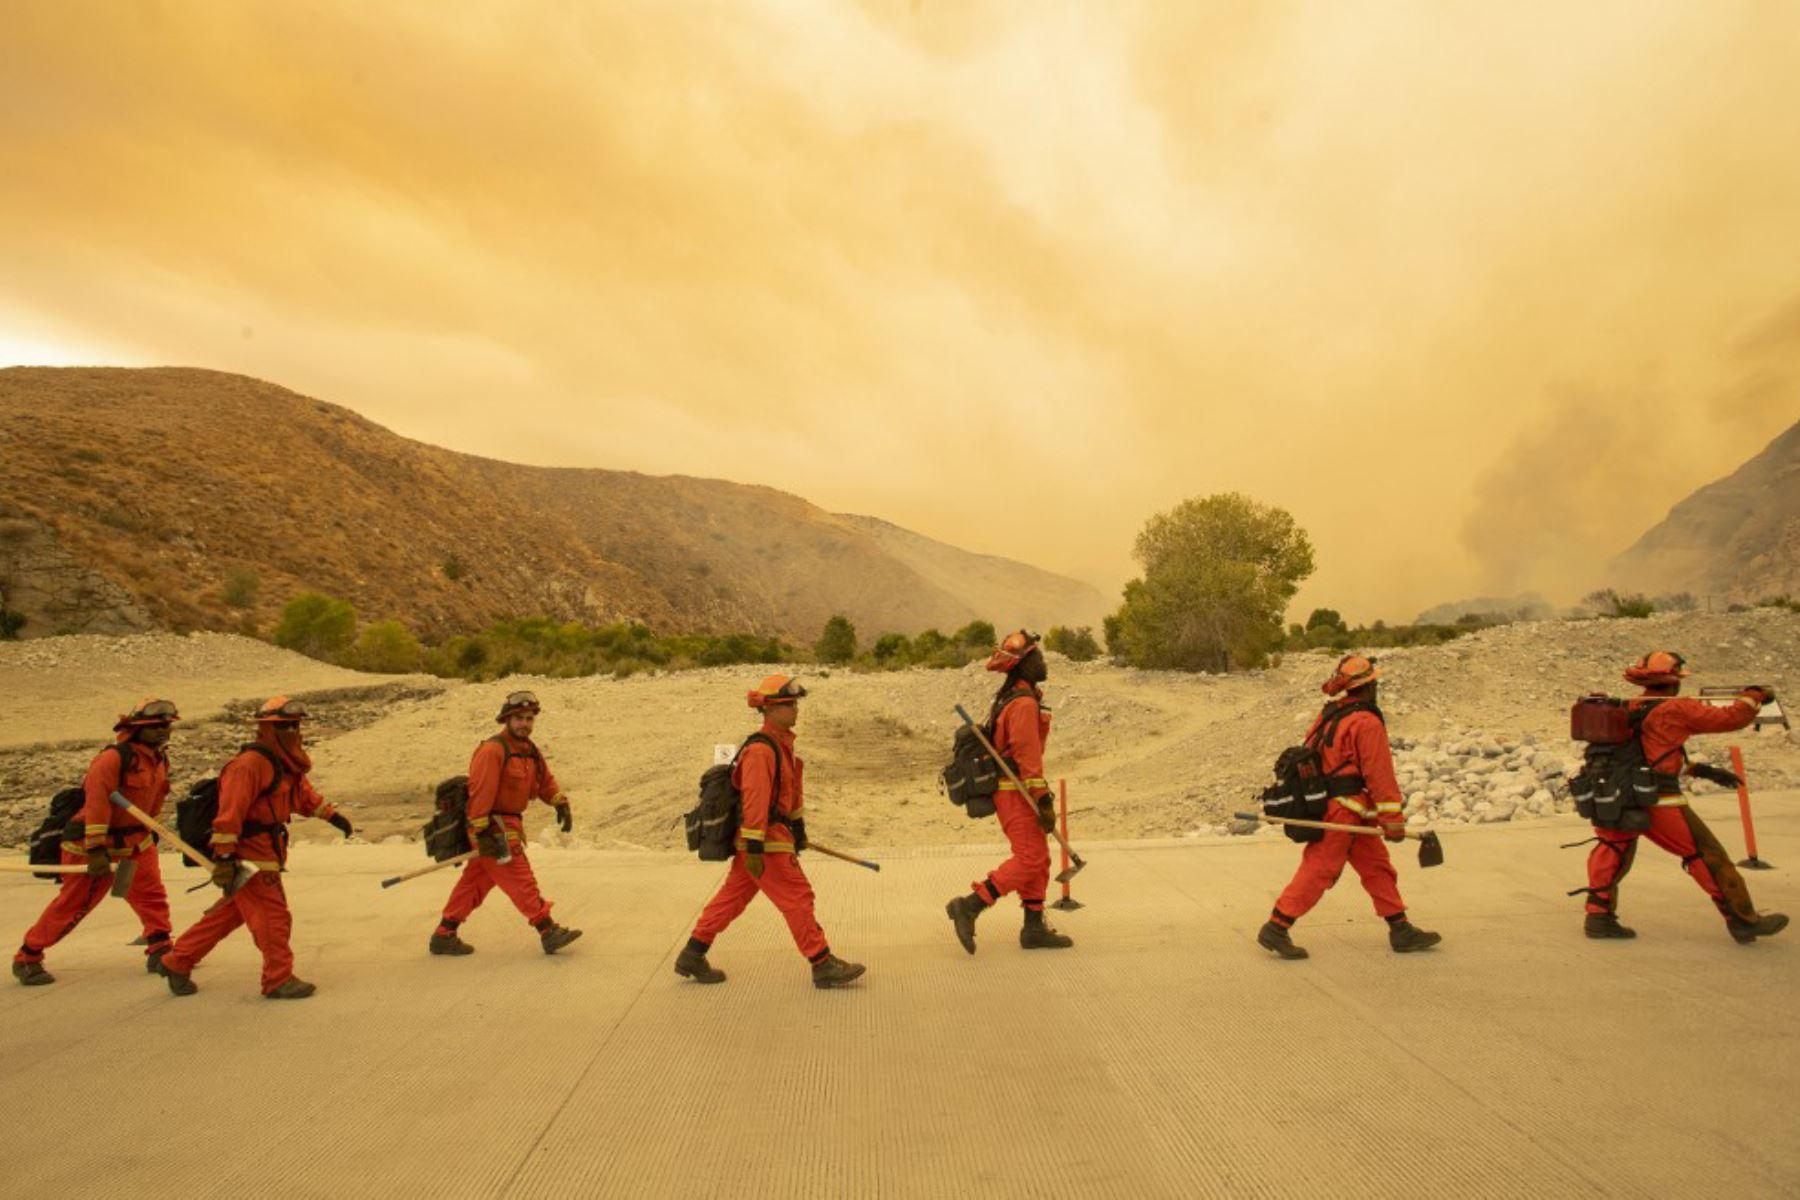 Bomberos llegan a la escena del incendio forestal en Whitewater, California. Foto: AFP